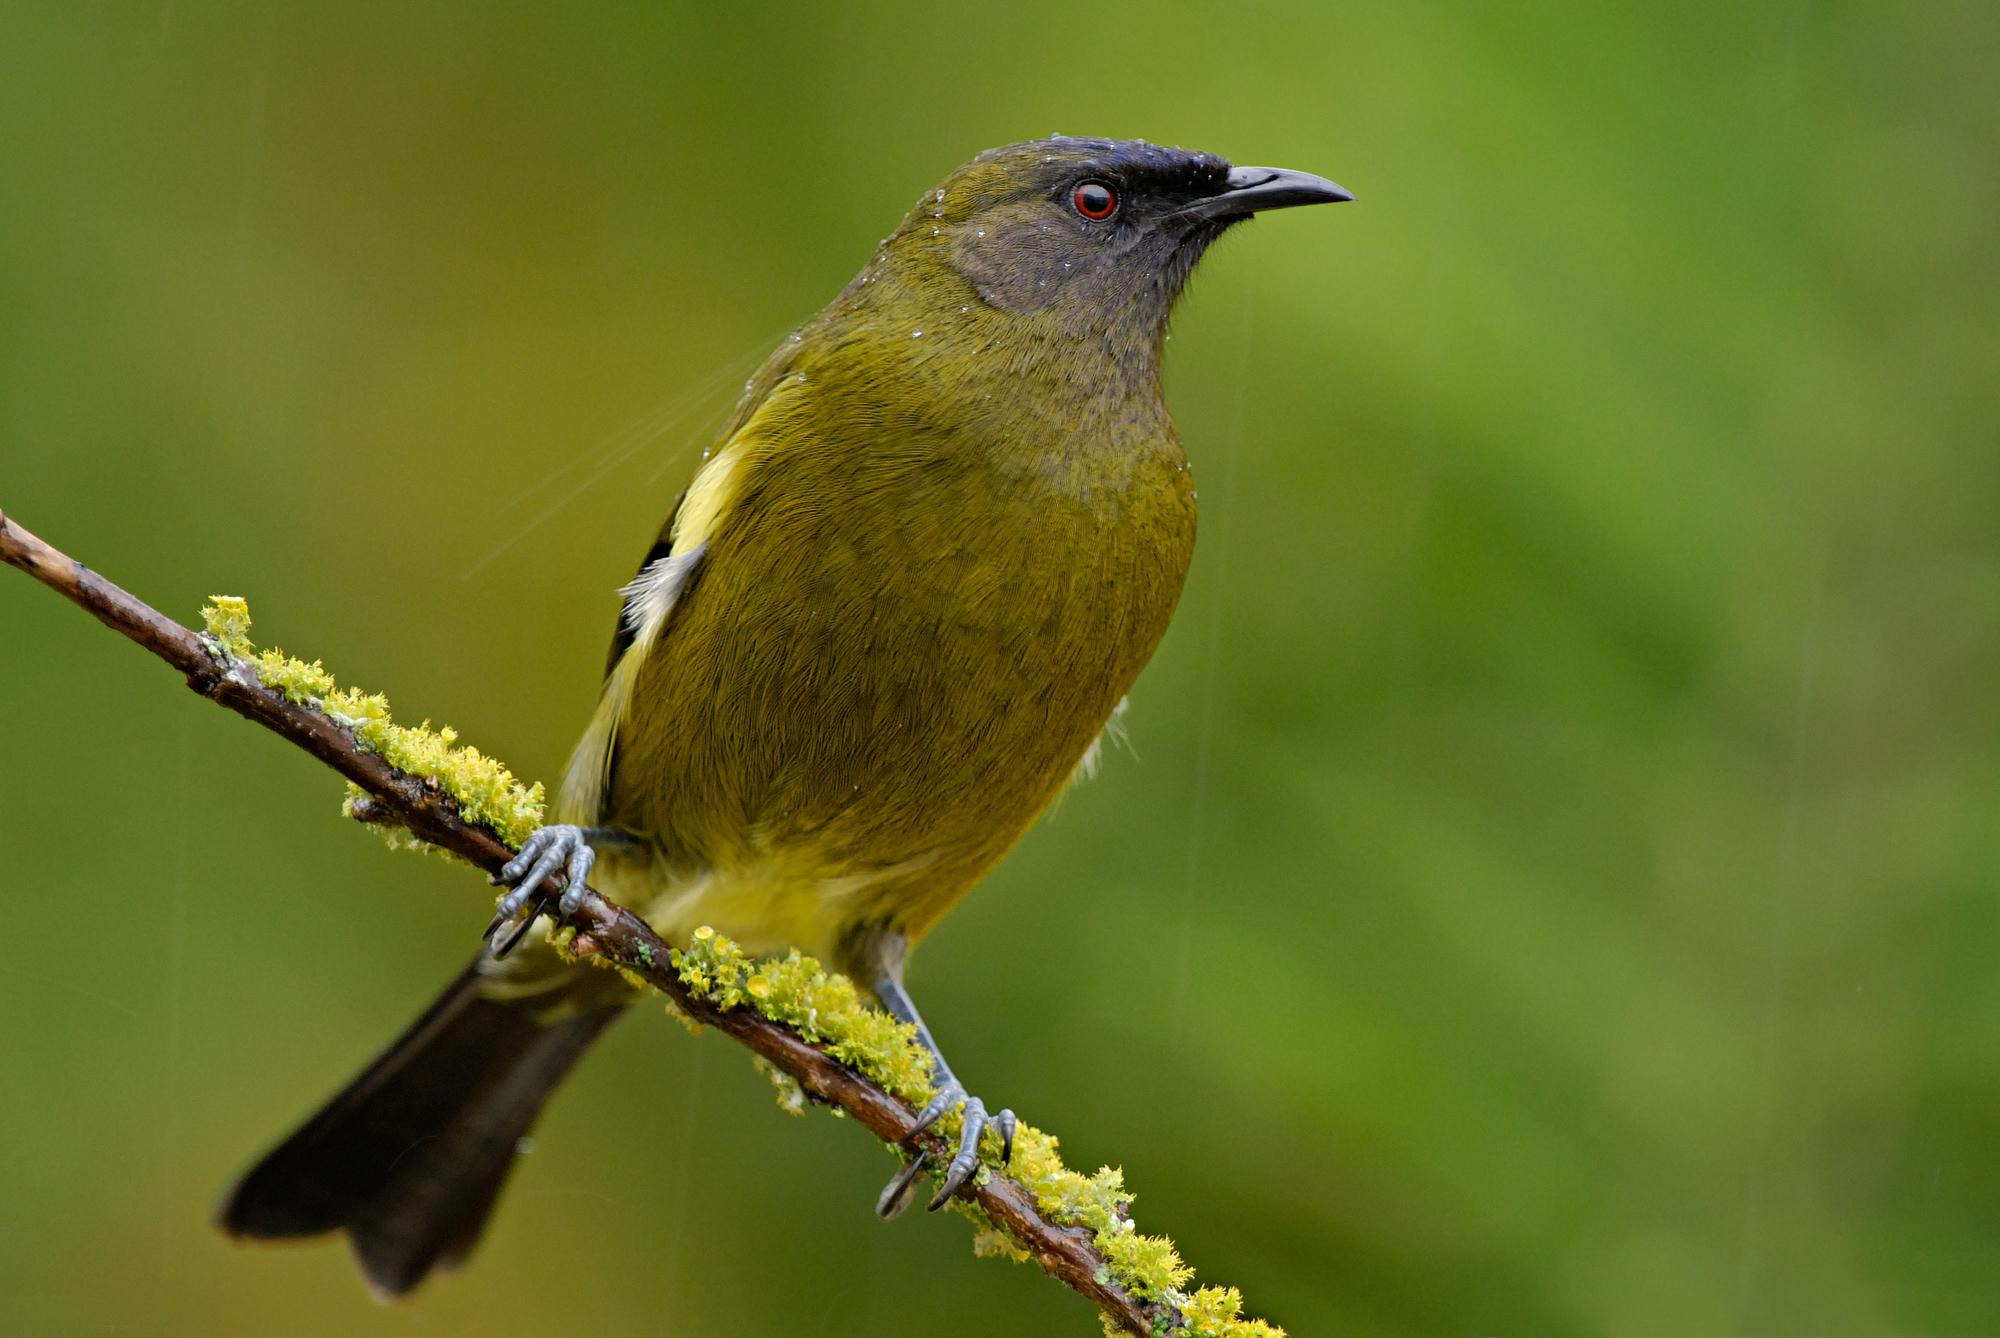 Bellbird. Adult male. Dunedin, July 2009. Image © Craig McKenzie by